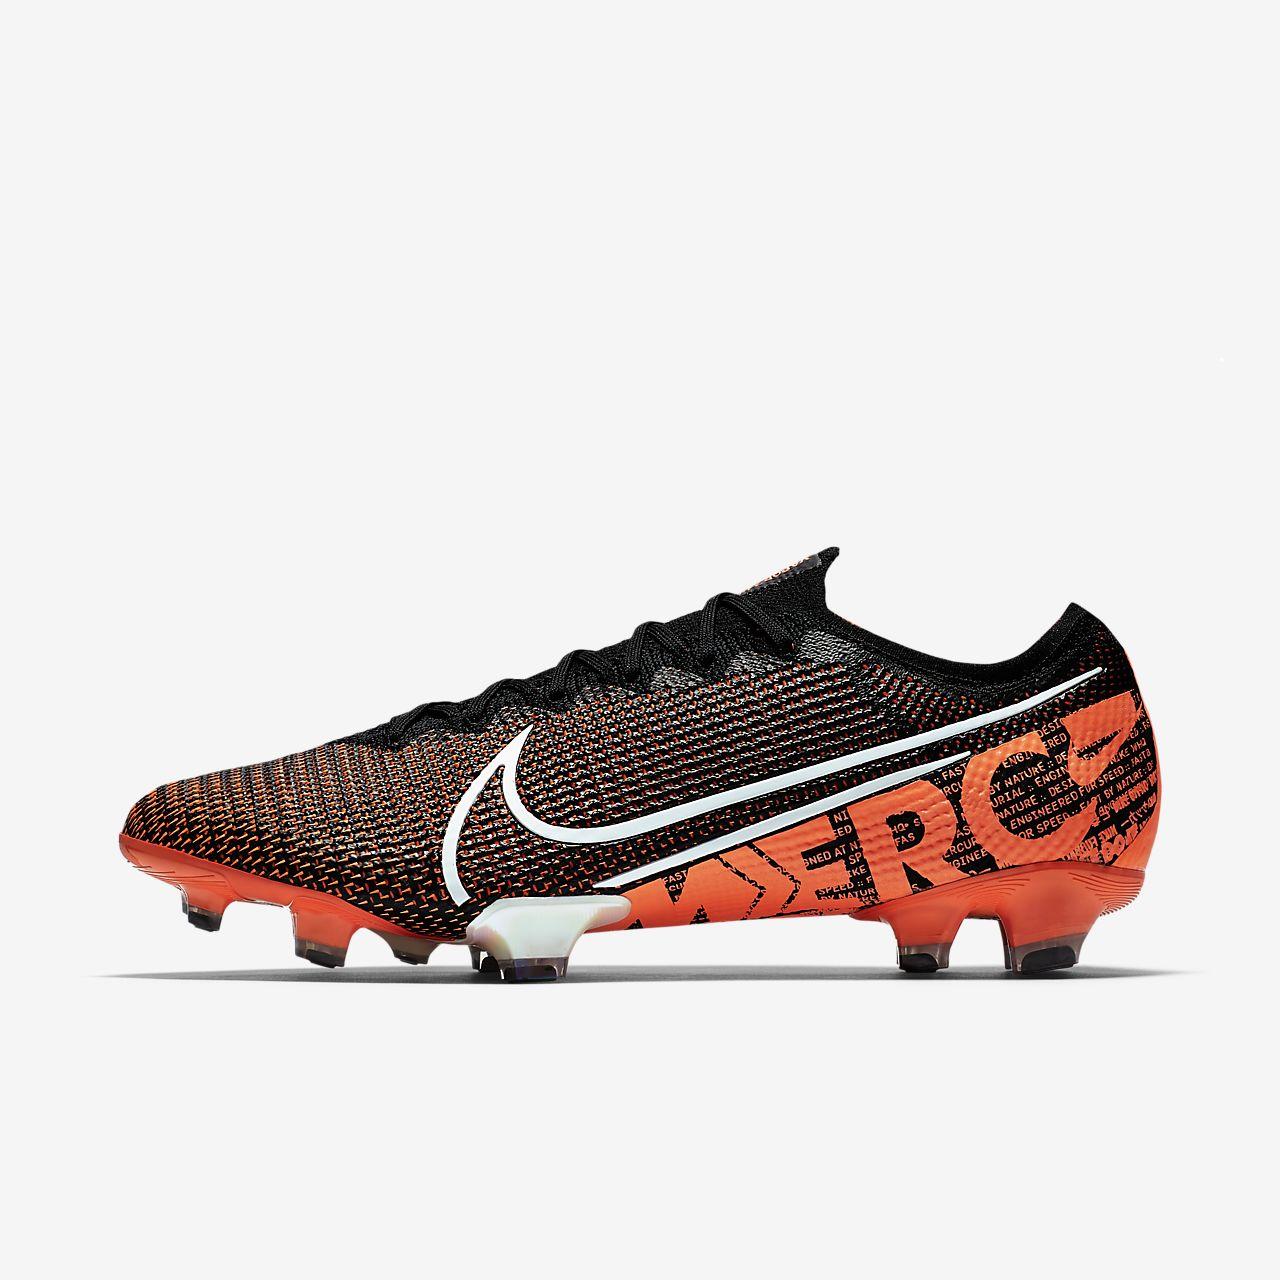 Scarpa da calcio per terreni duri Nike Mercurial Vapor 13 Elite FG